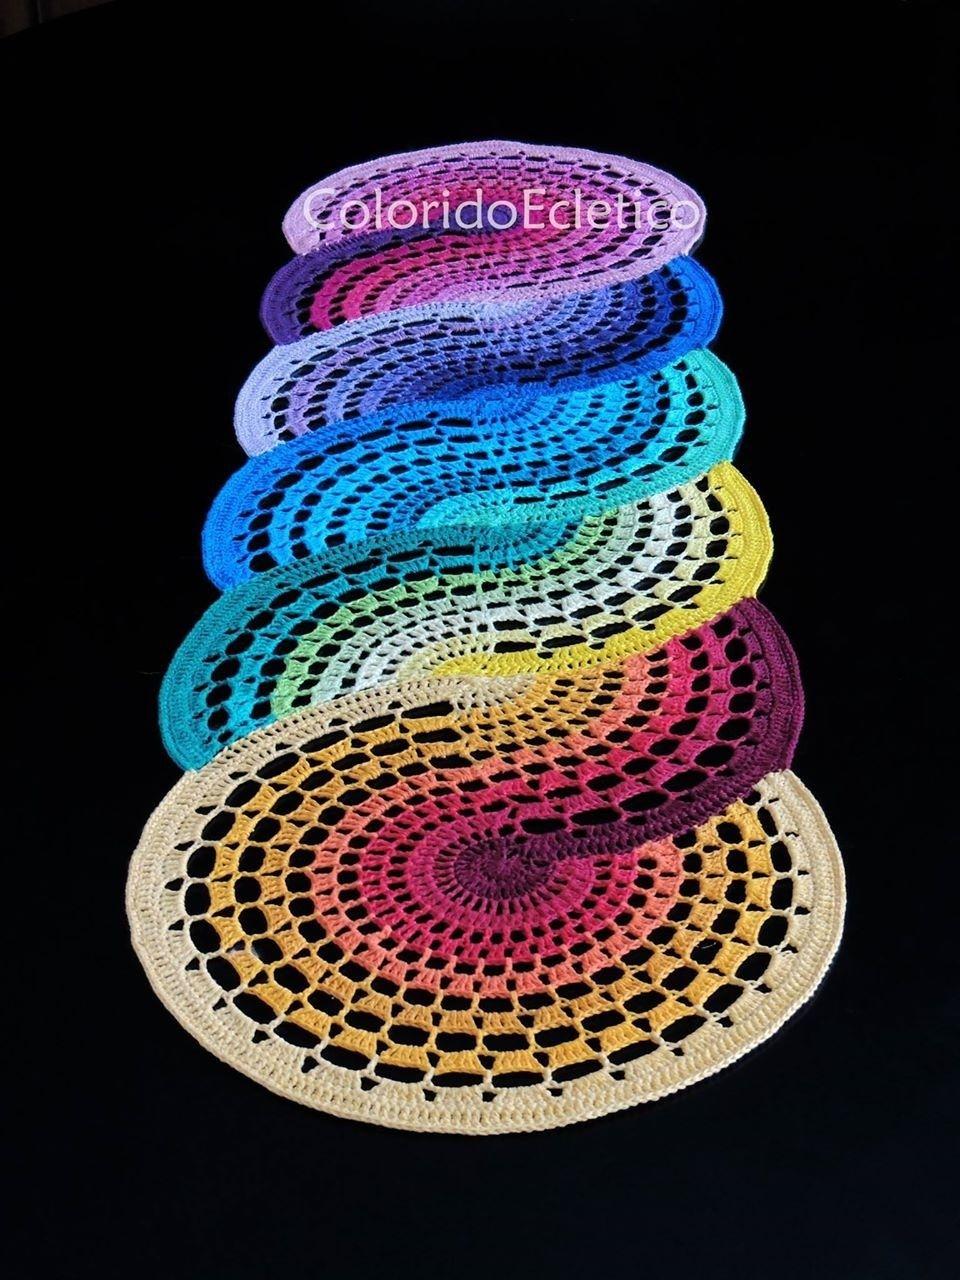 Swirl rainbow rug notapattern inspiration pinteres swirl rainbow rug notapattern inspiration more bankloansurffo Gallery